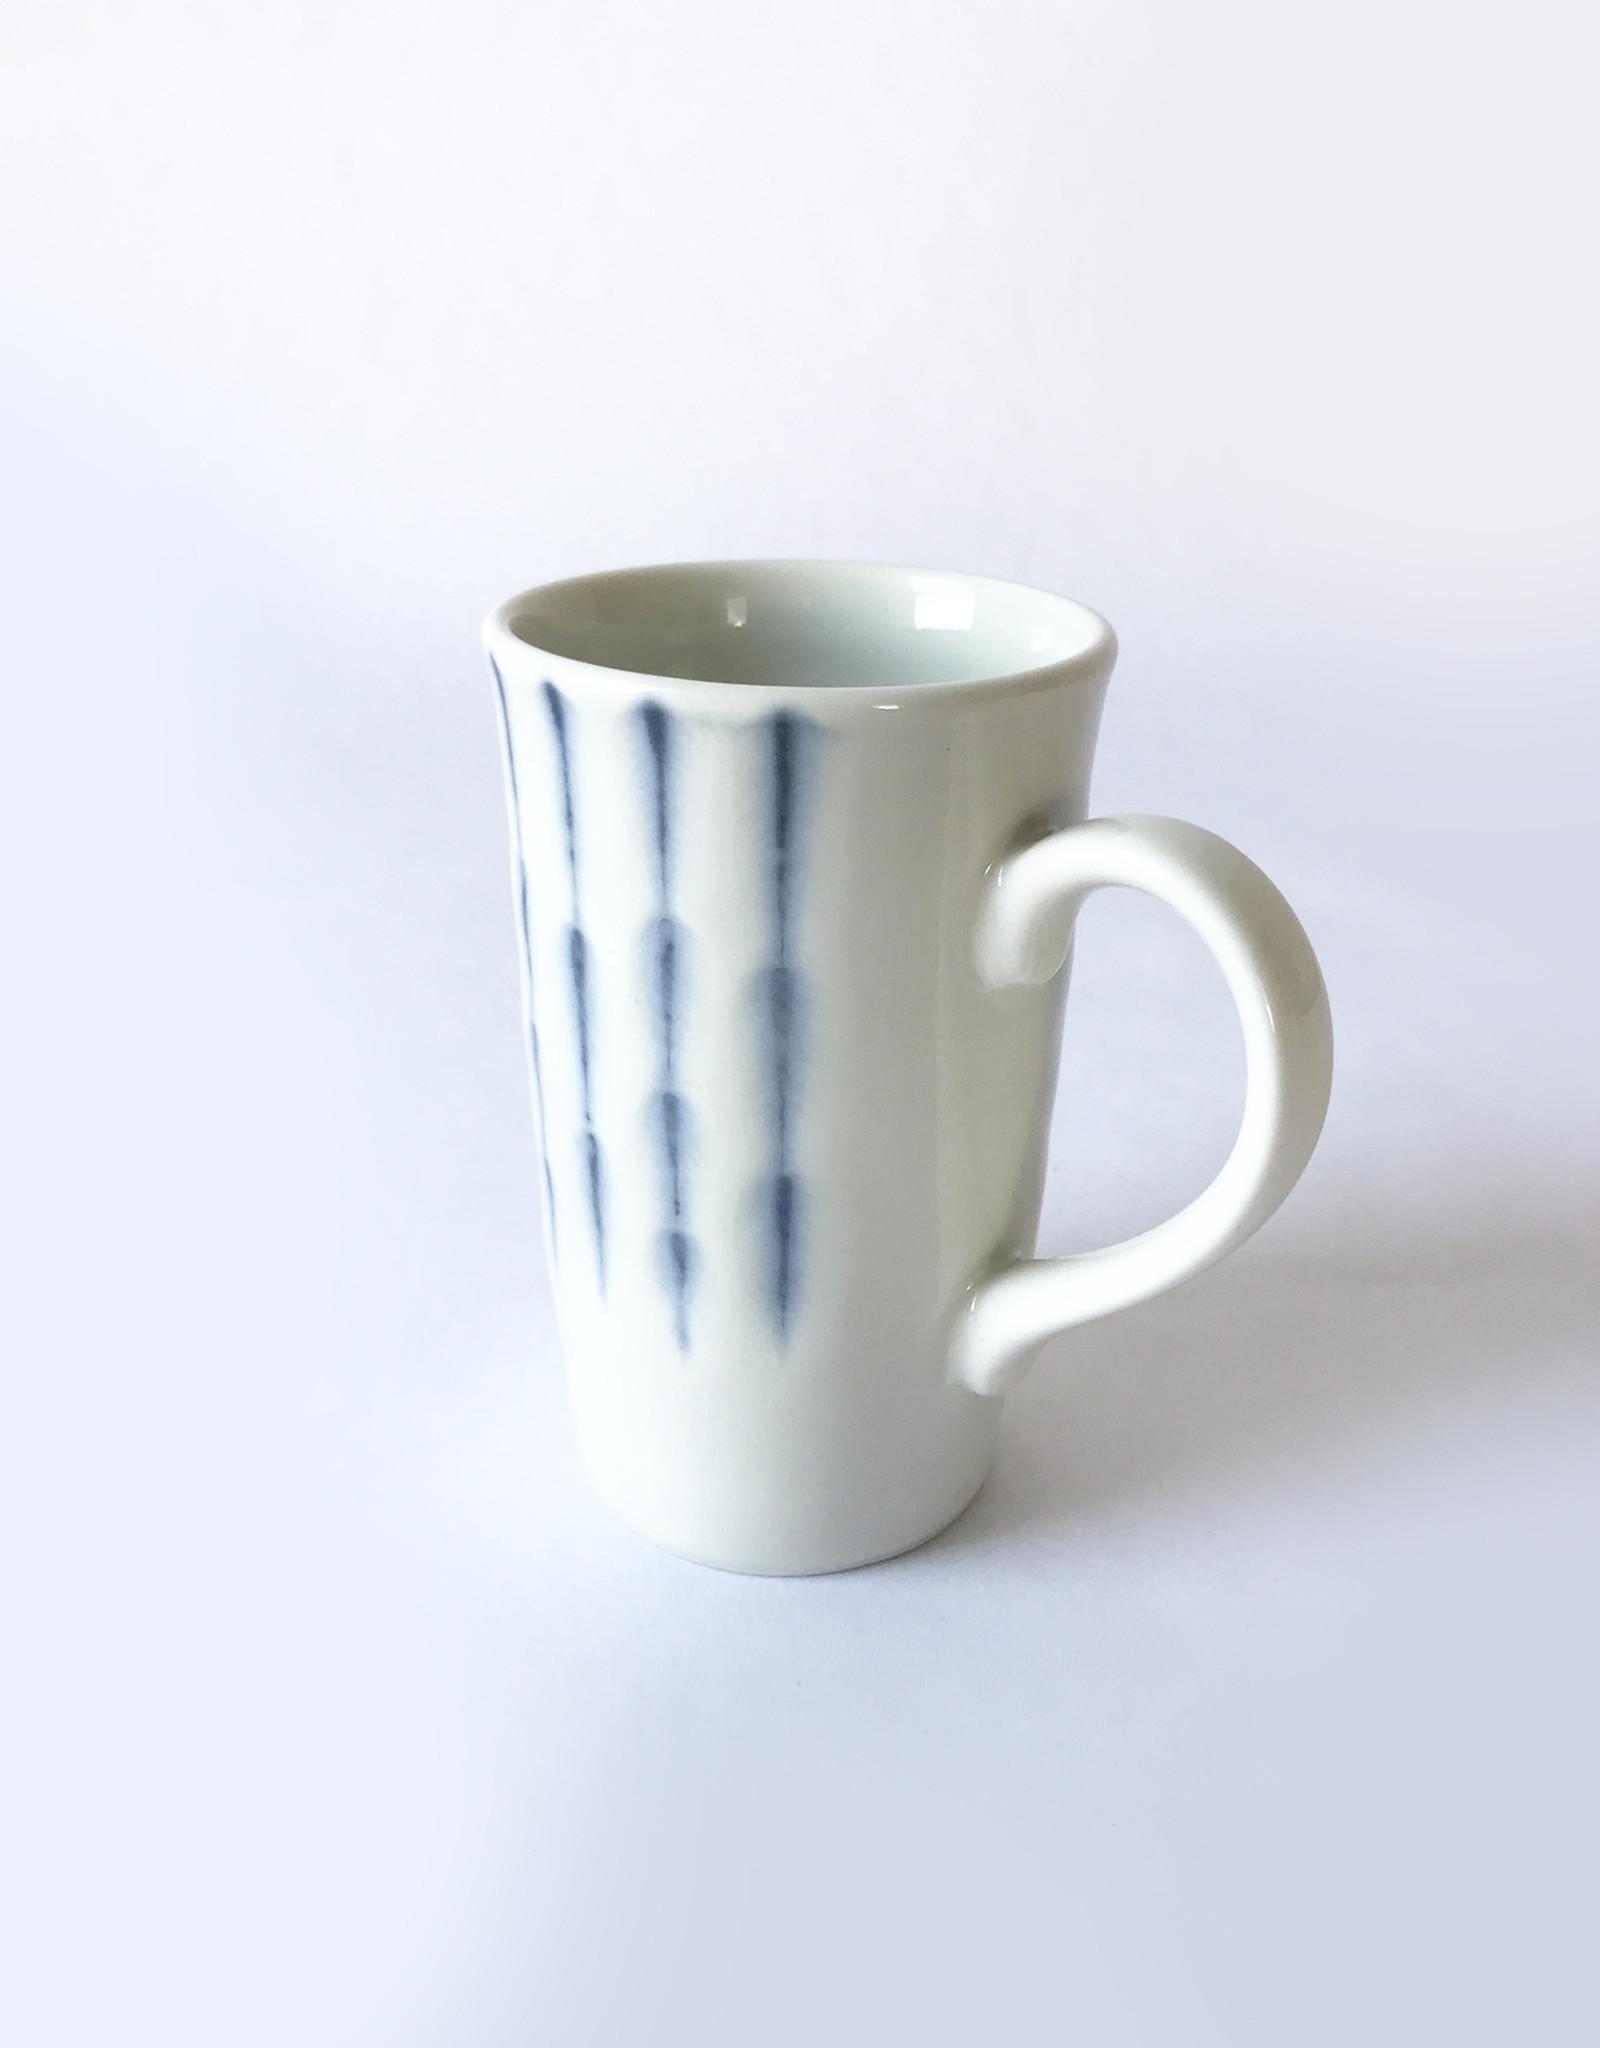 Miya Coffee Mug with Feathered Blue Stripes